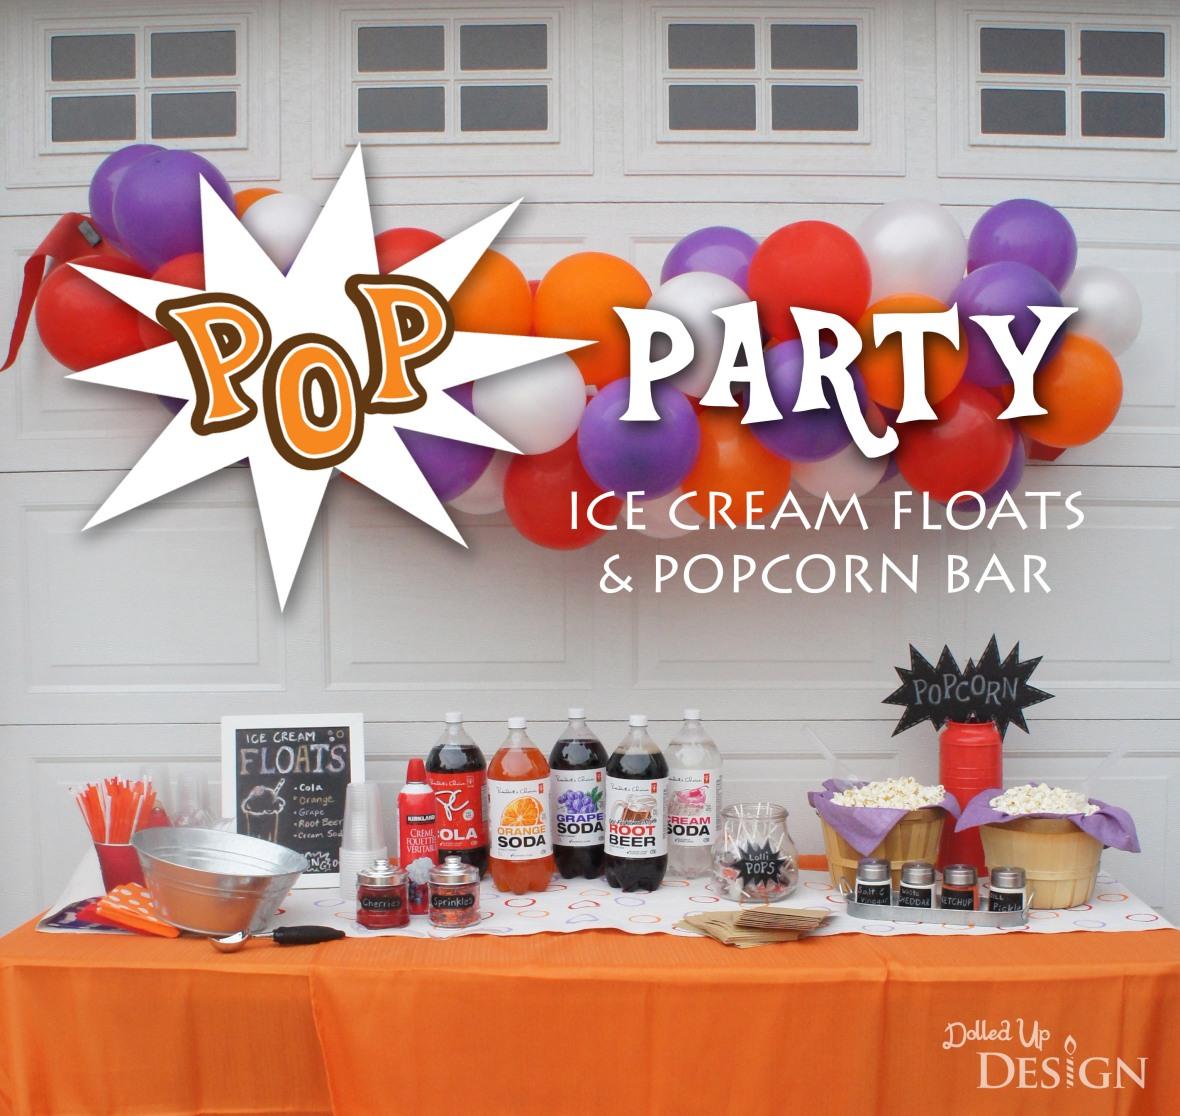 Pop Party_Ice Cream Floats & Popcorn Bar